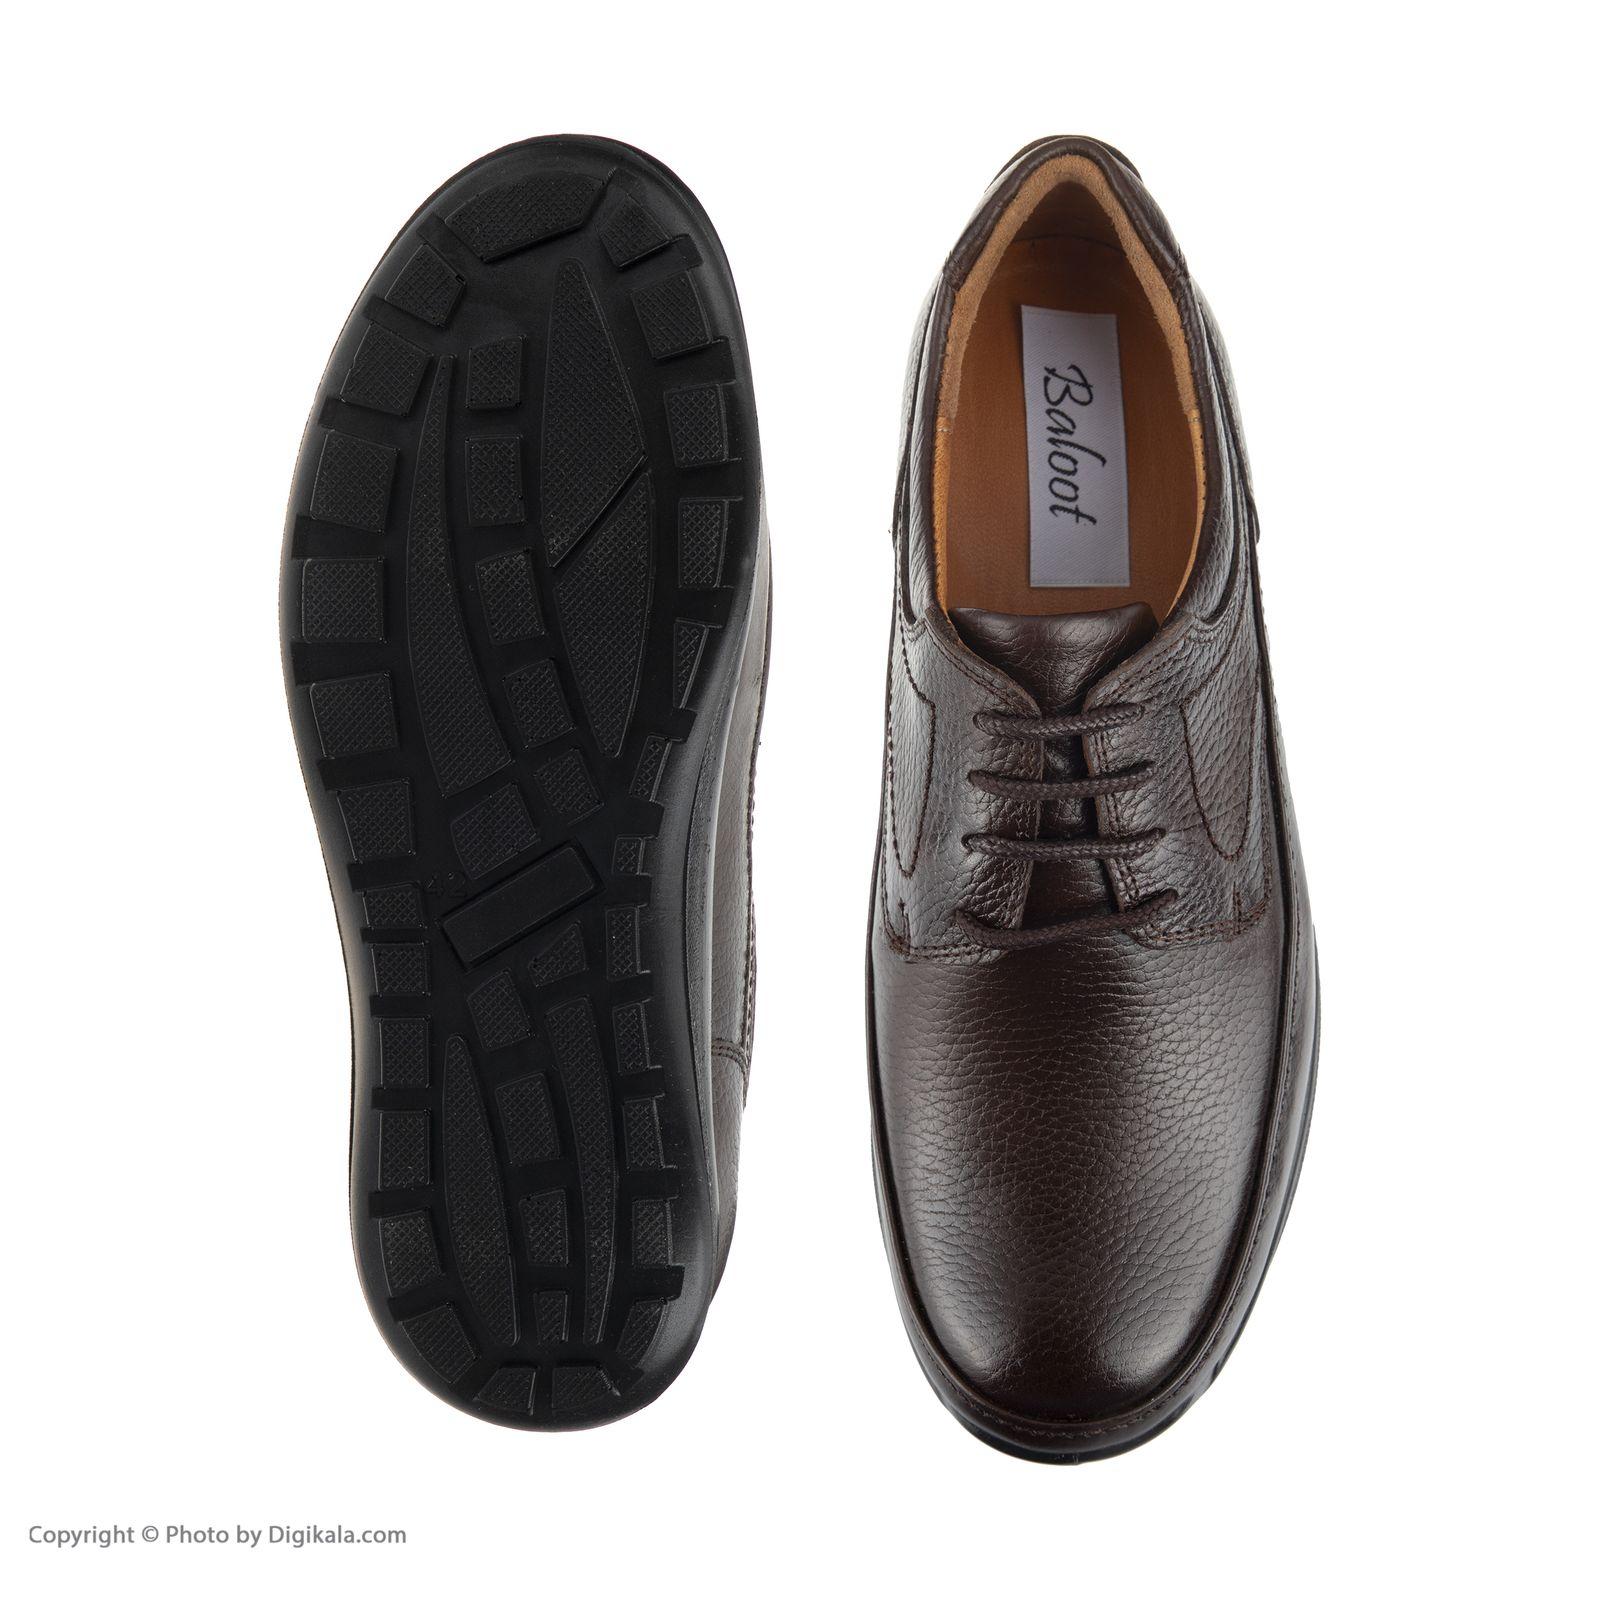 کفش روزمره مردانه بلوط مدل 7266C503104 -  - 6